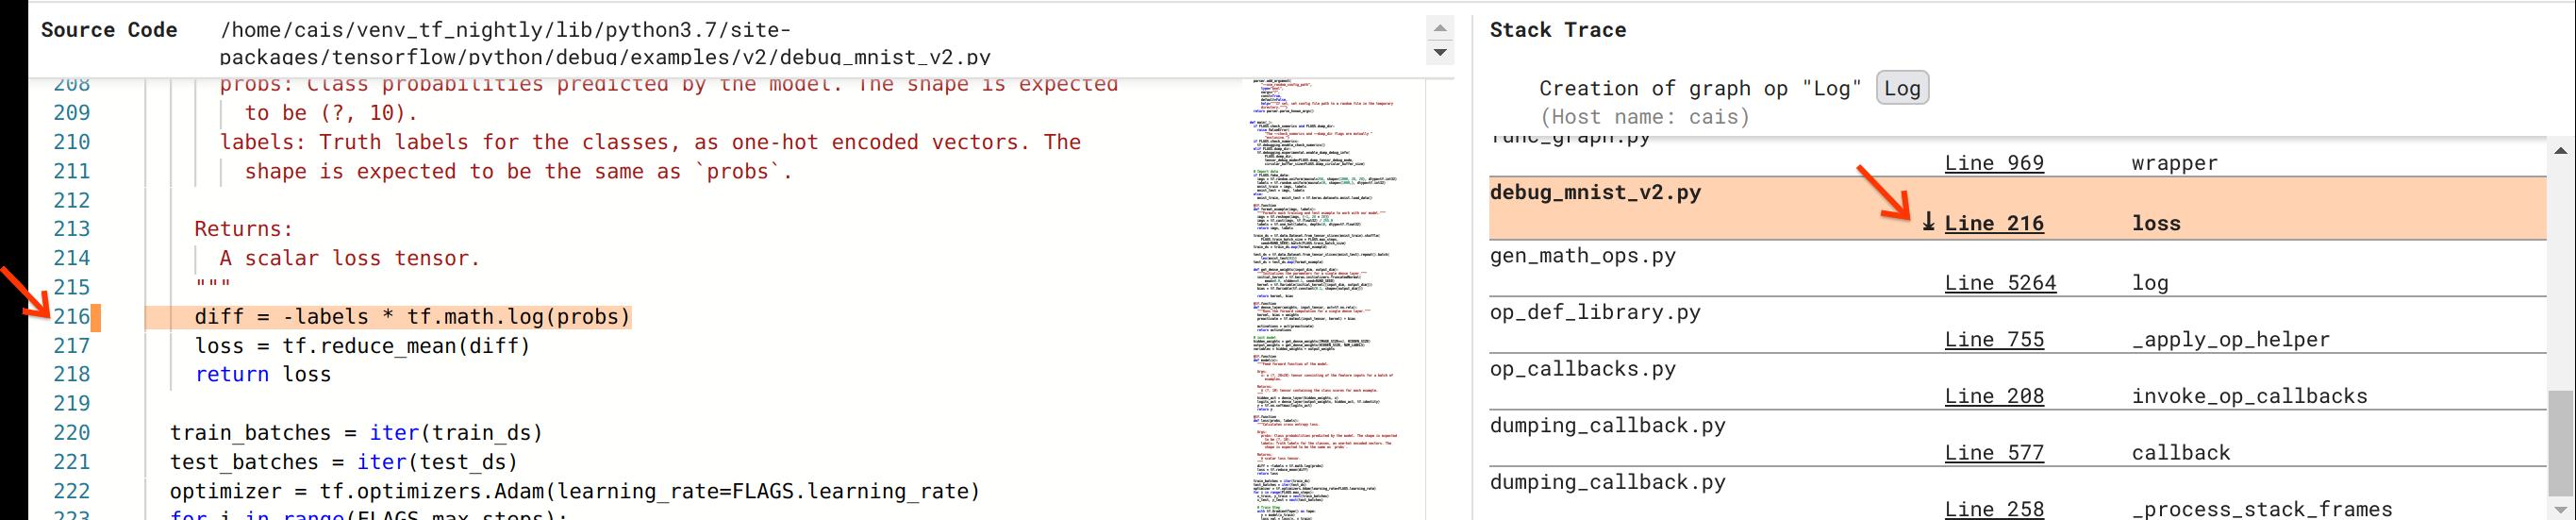 Debugger V2: Source code and stack trace